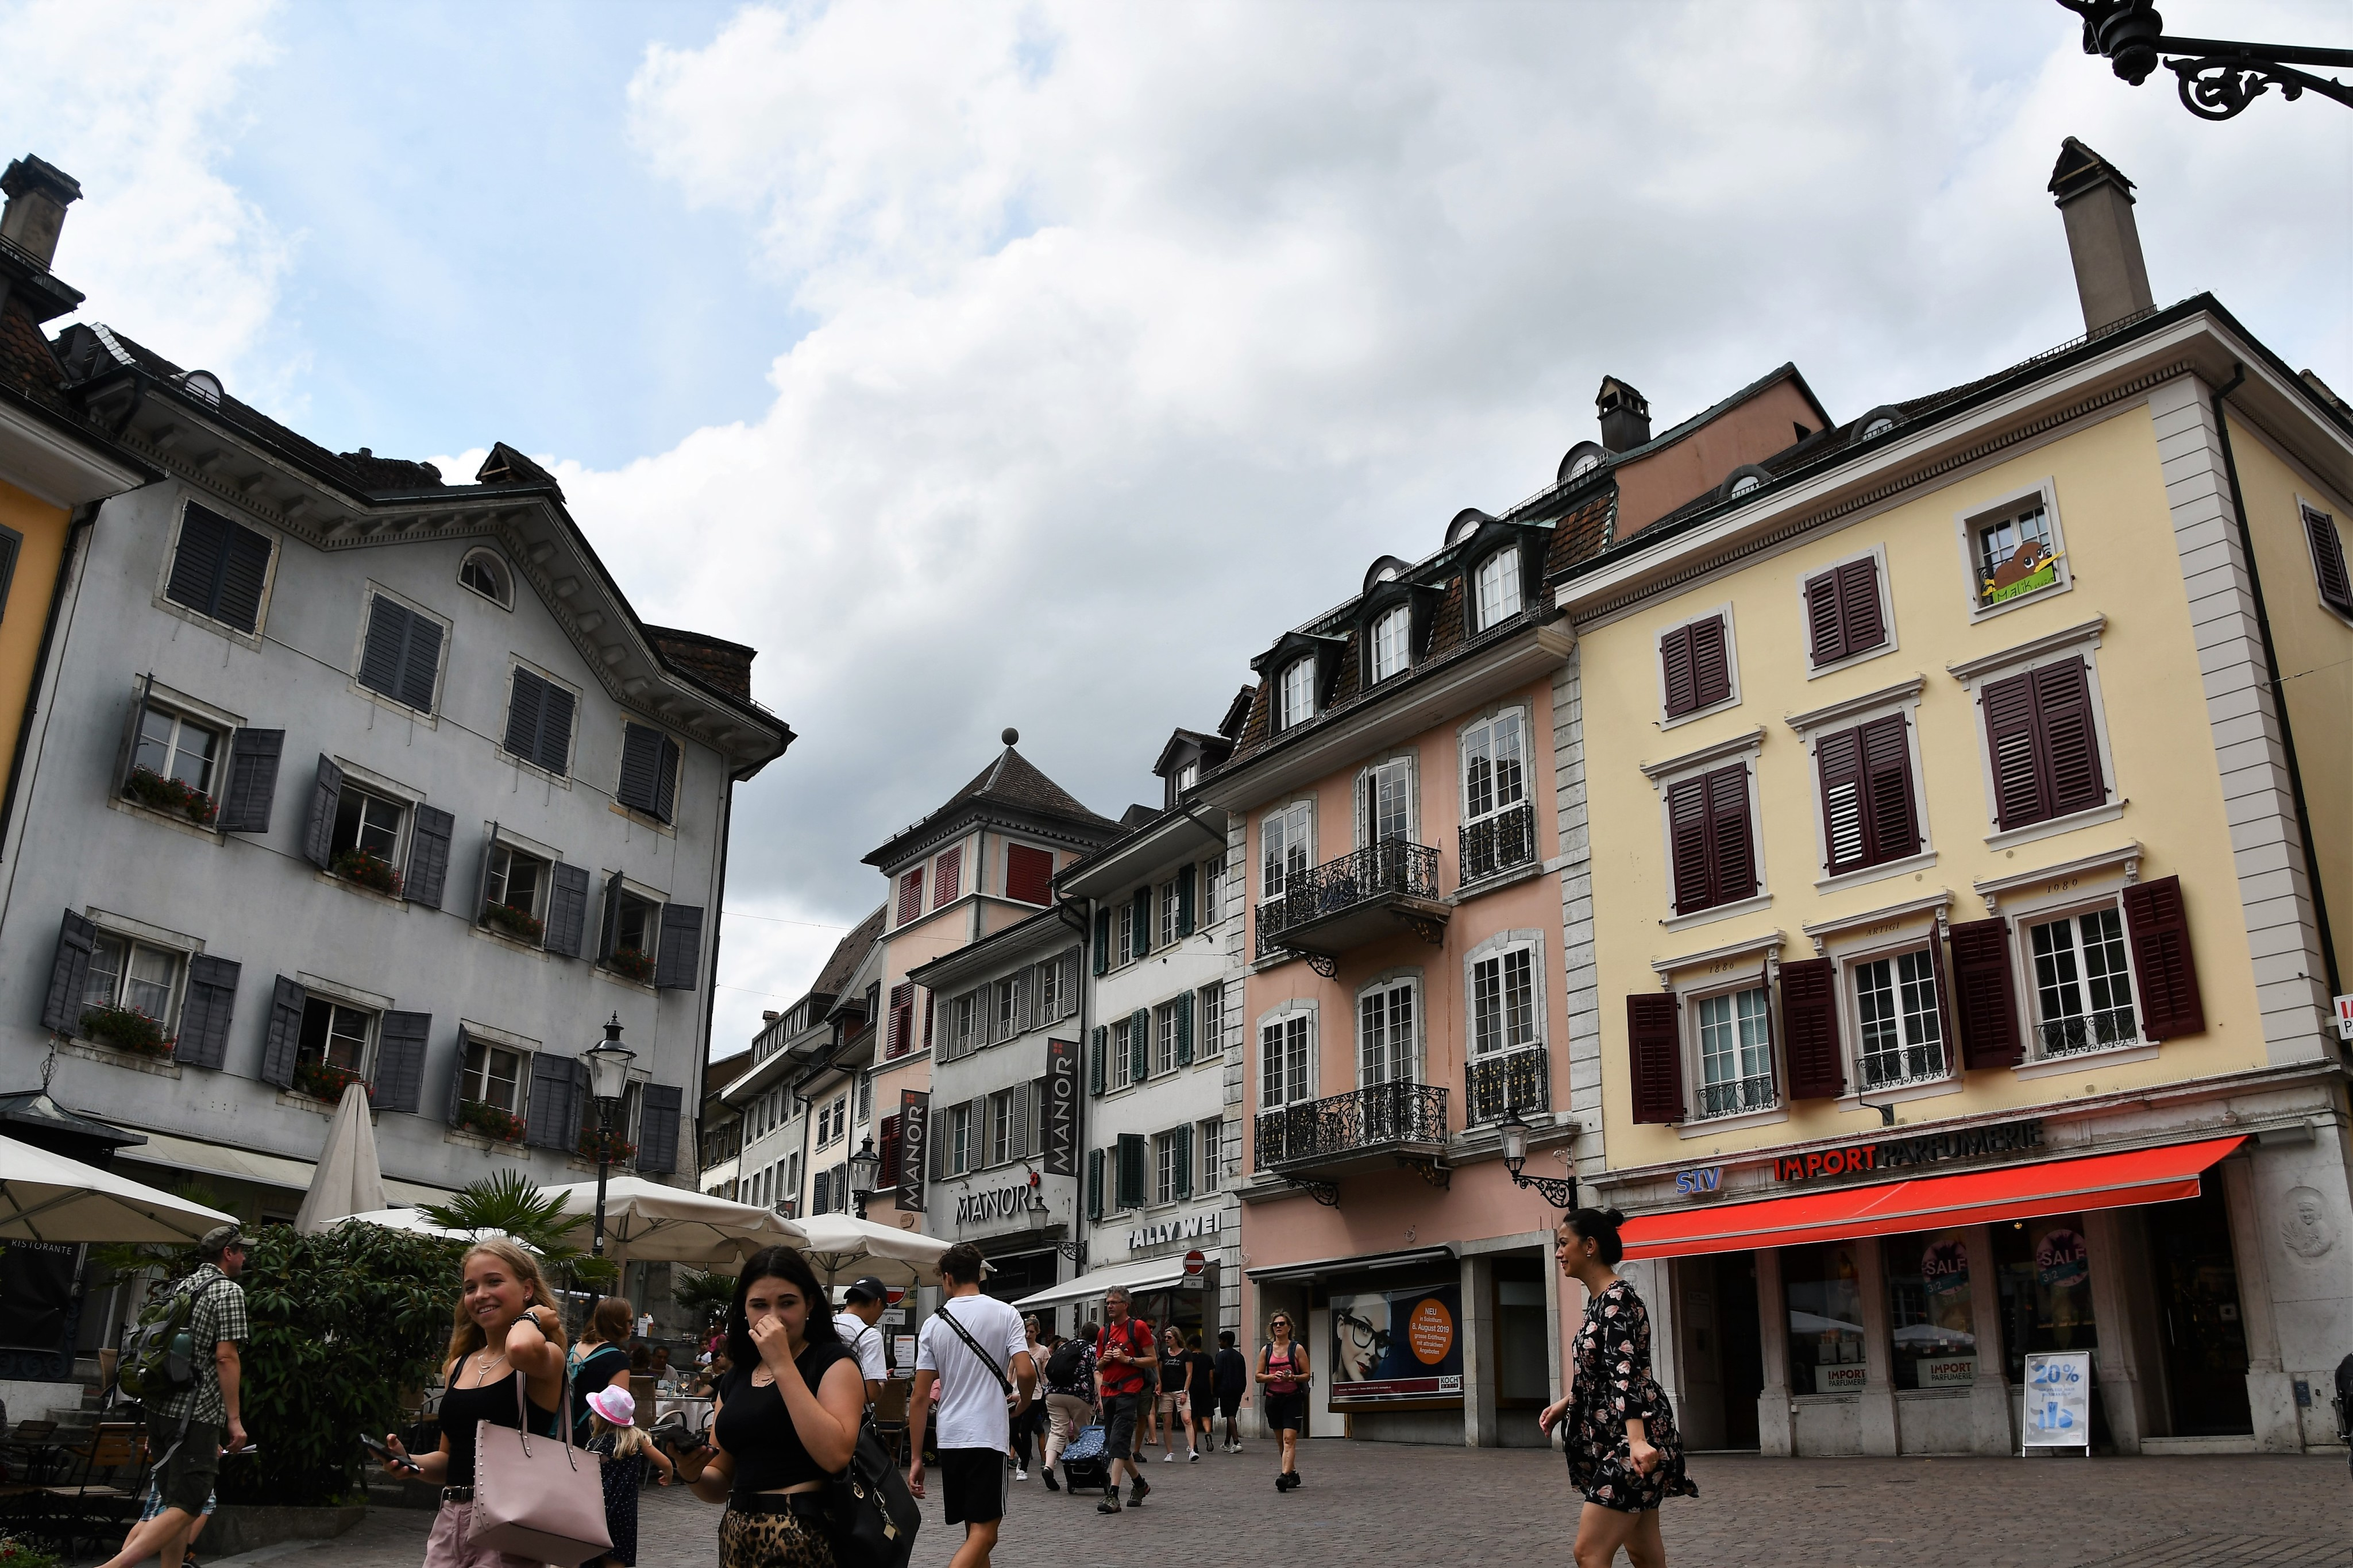 marktplatz-solothurn-27907.2019